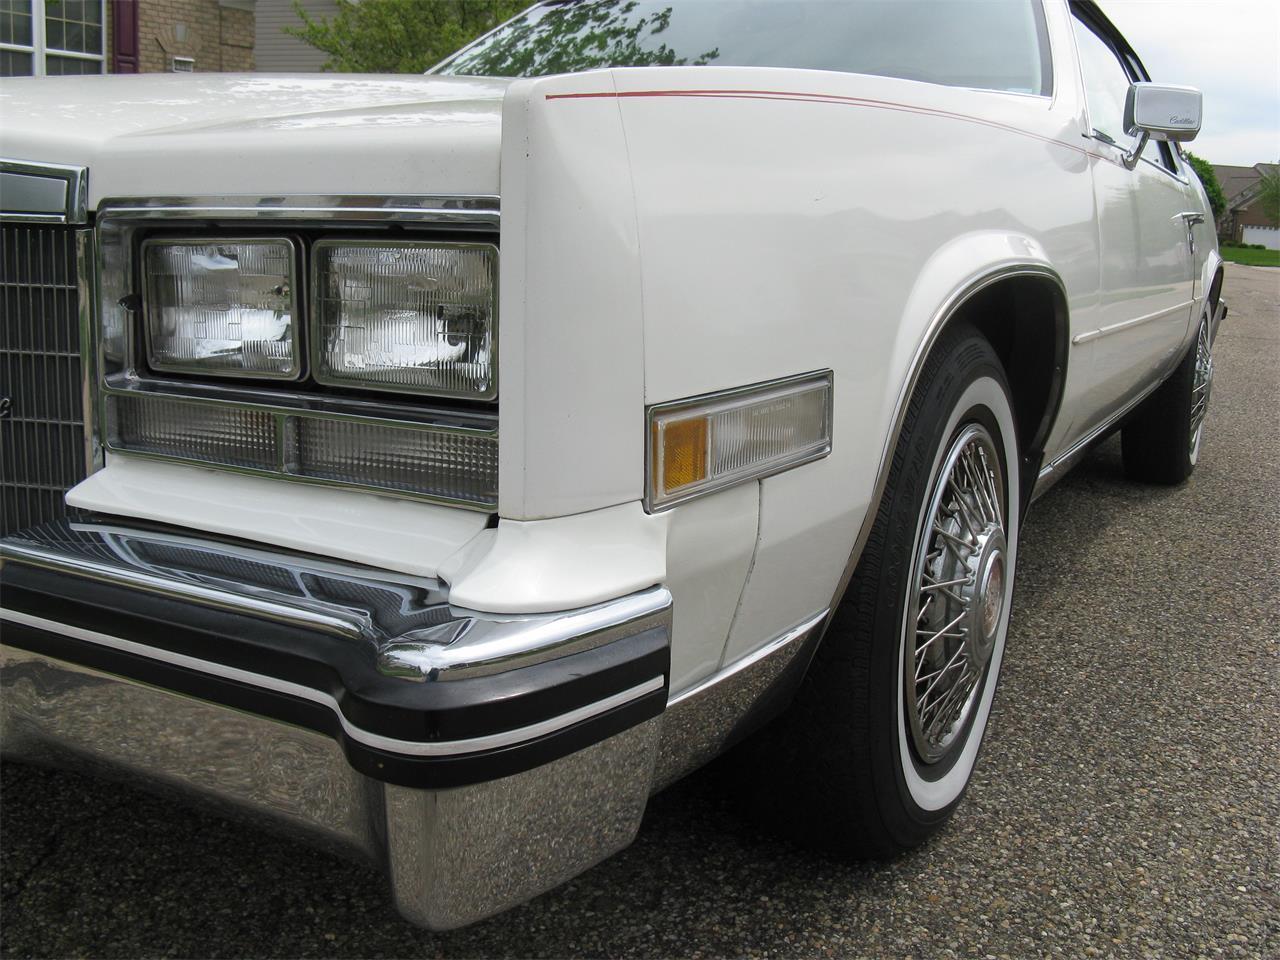 1984 Cadillac Eldorado (CC-1359064) for sale in Shaker Heights, Ohio